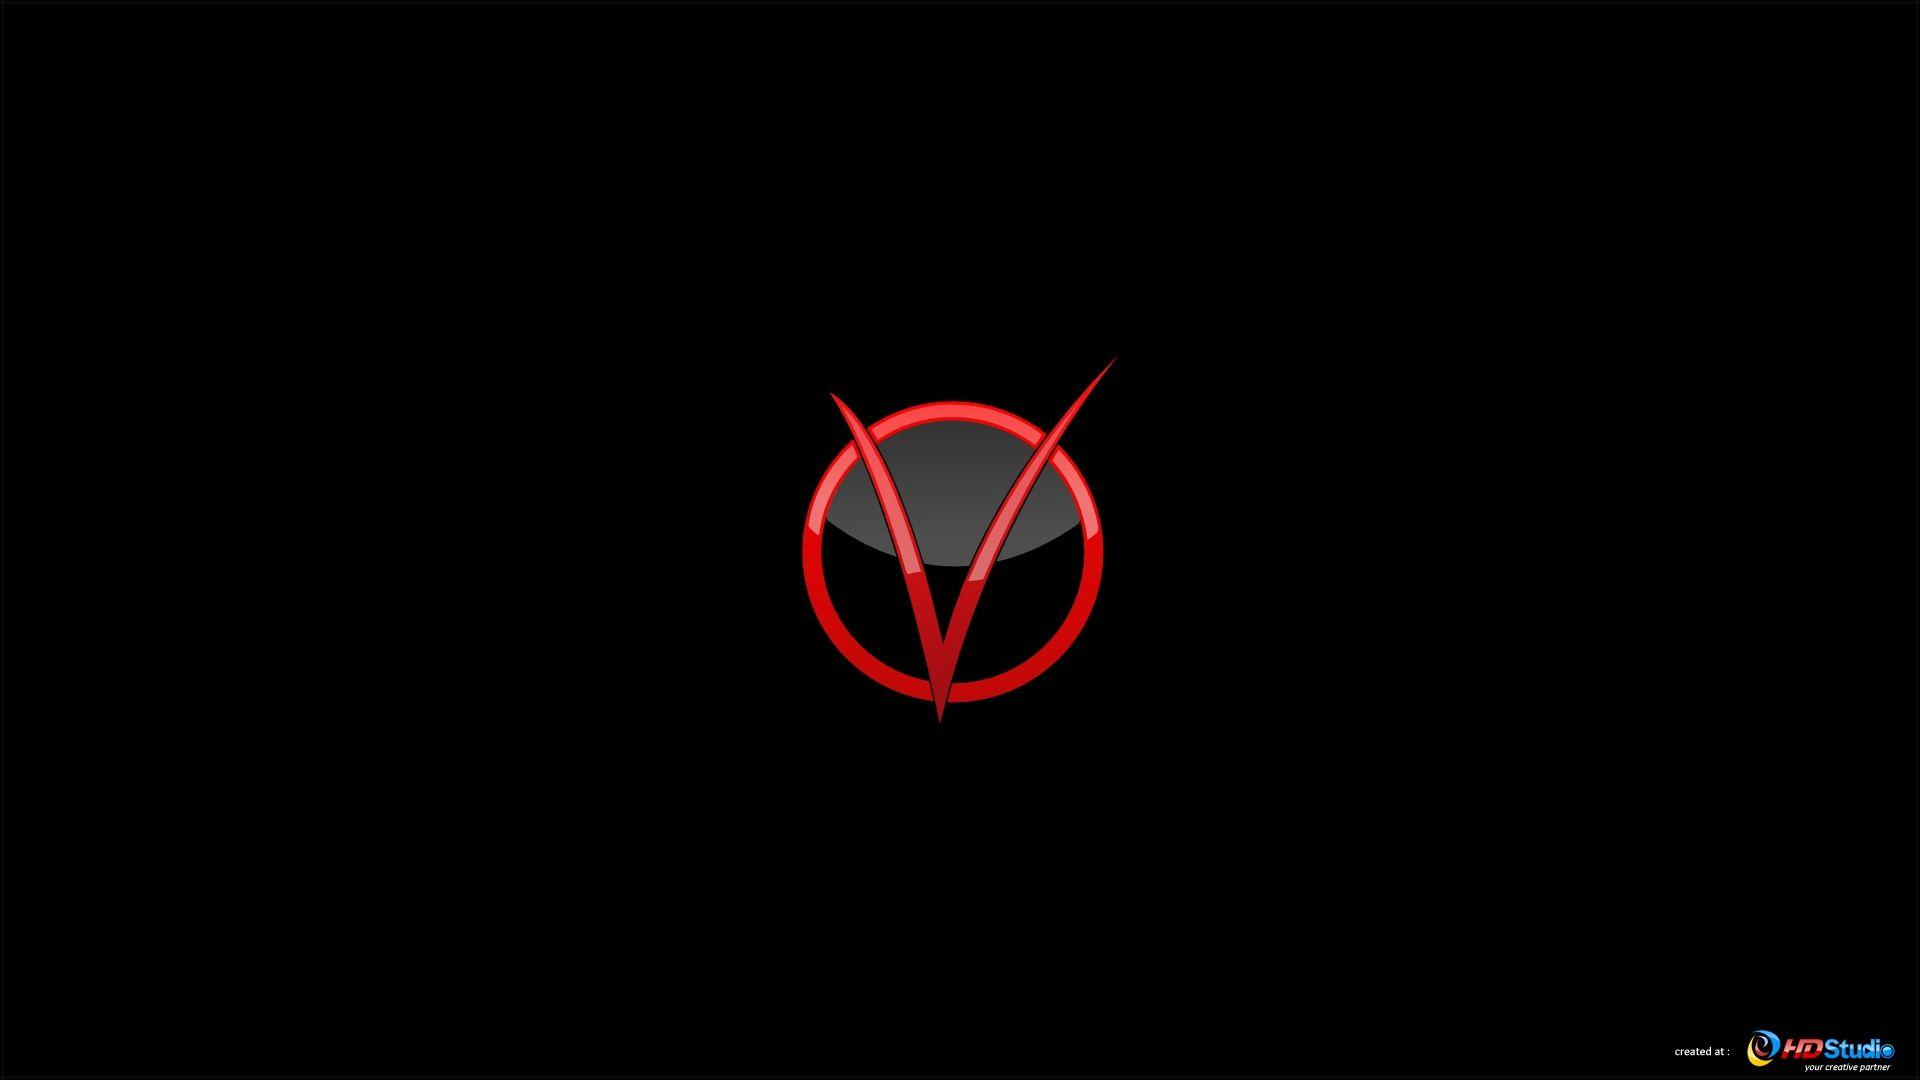 Vendetta Hd Wallpapers Wallpaper Cave